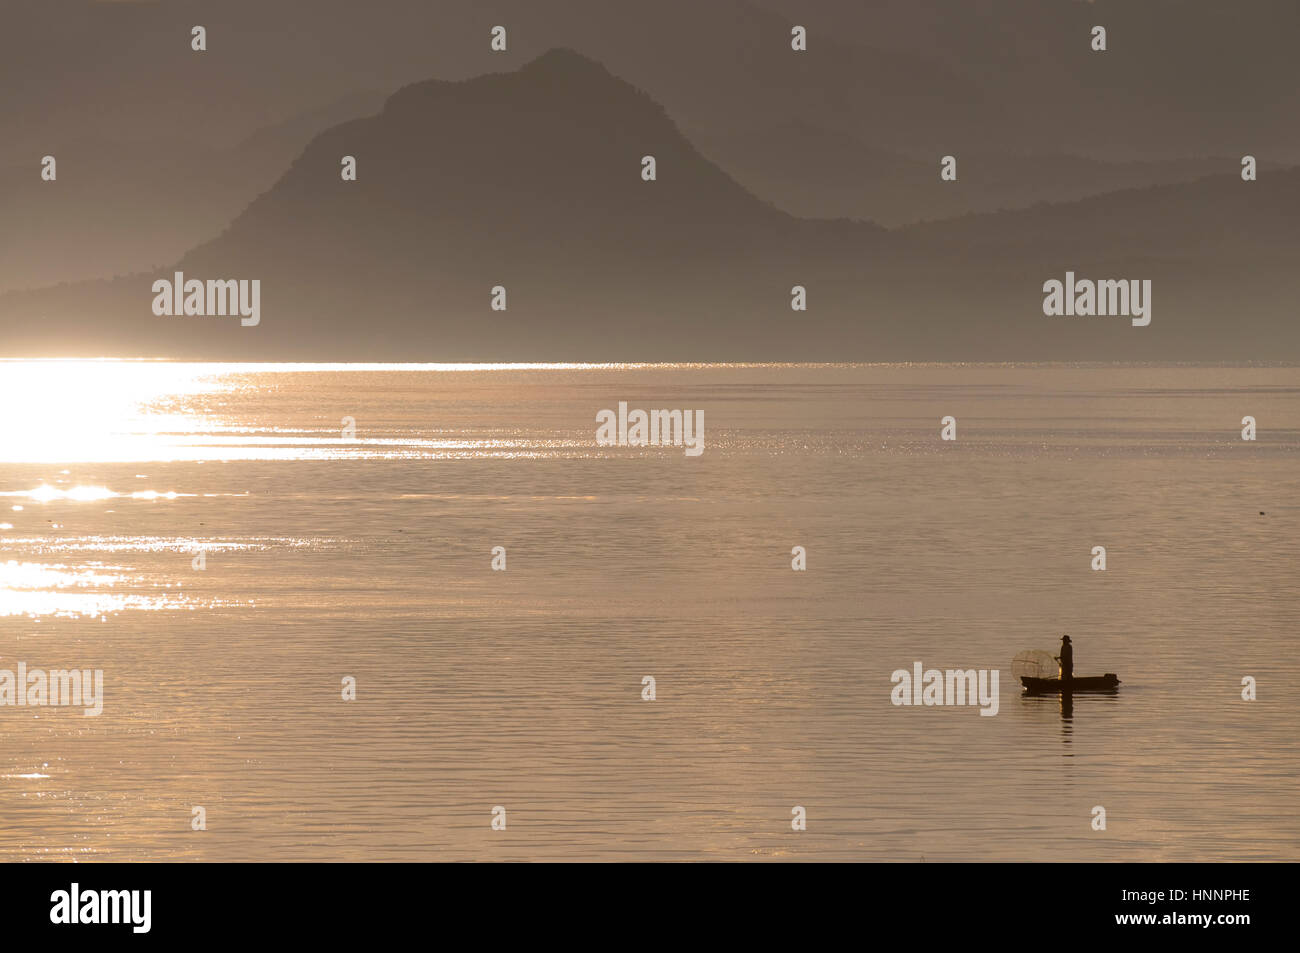 Scenes in Atitlan Lake, Guatemala - Stock Image